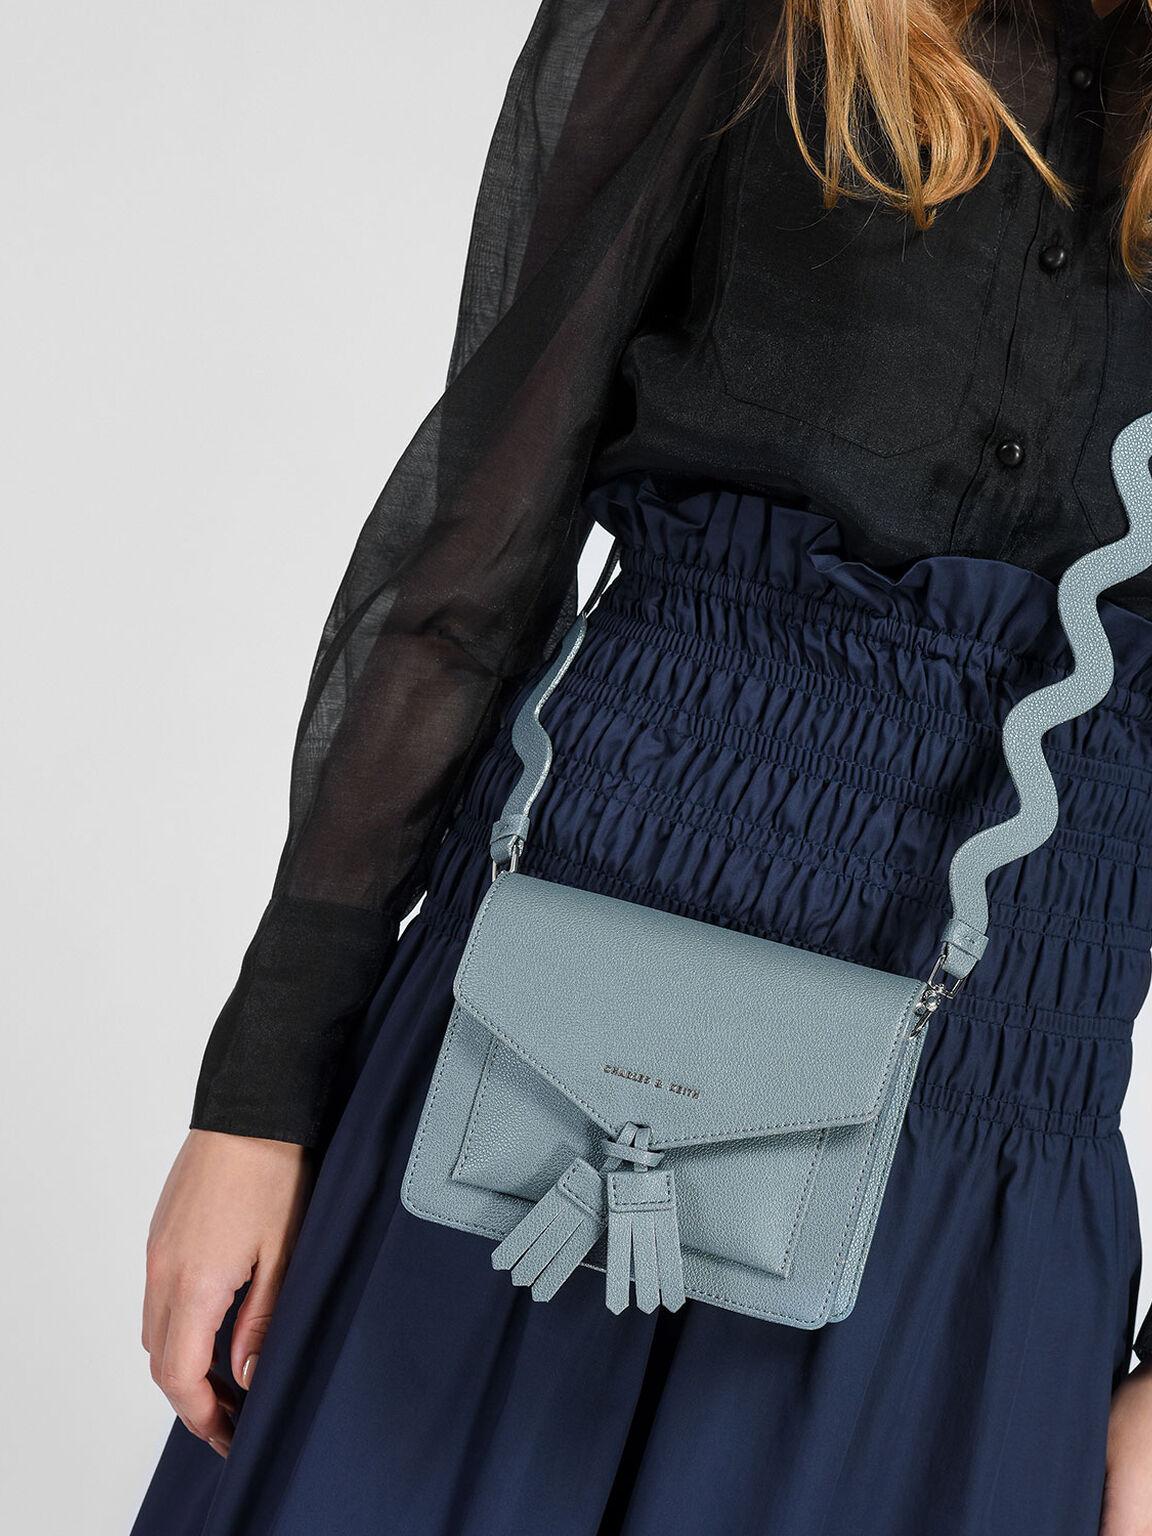 Tassel Detail Crossbody Bag, Steel Blue, hi-res